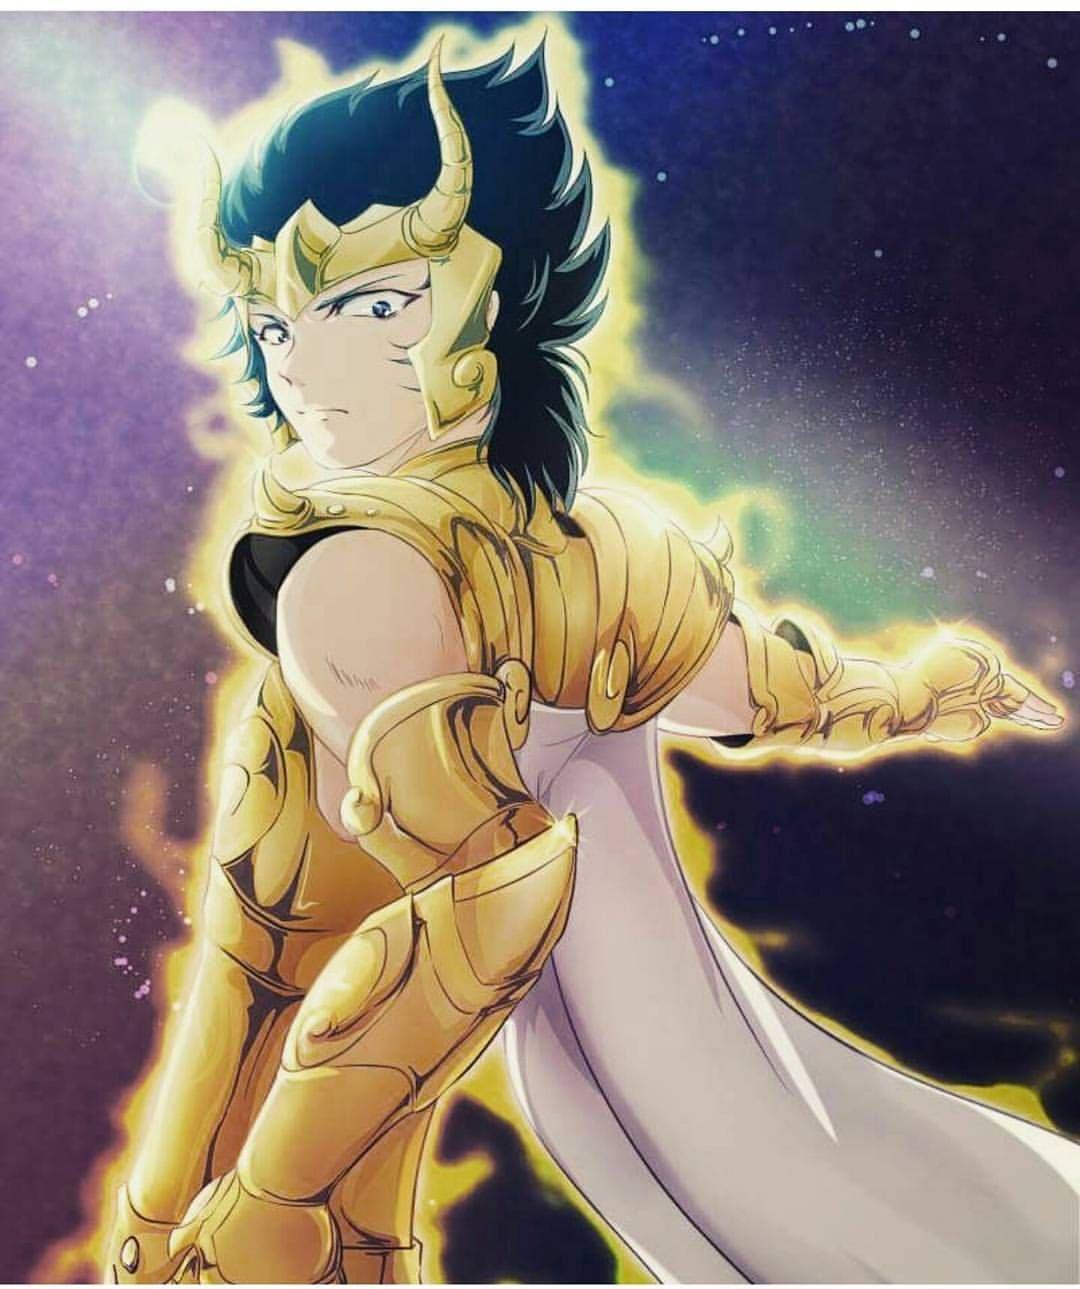 shura saint seiya Anime, Character, Zelda characters